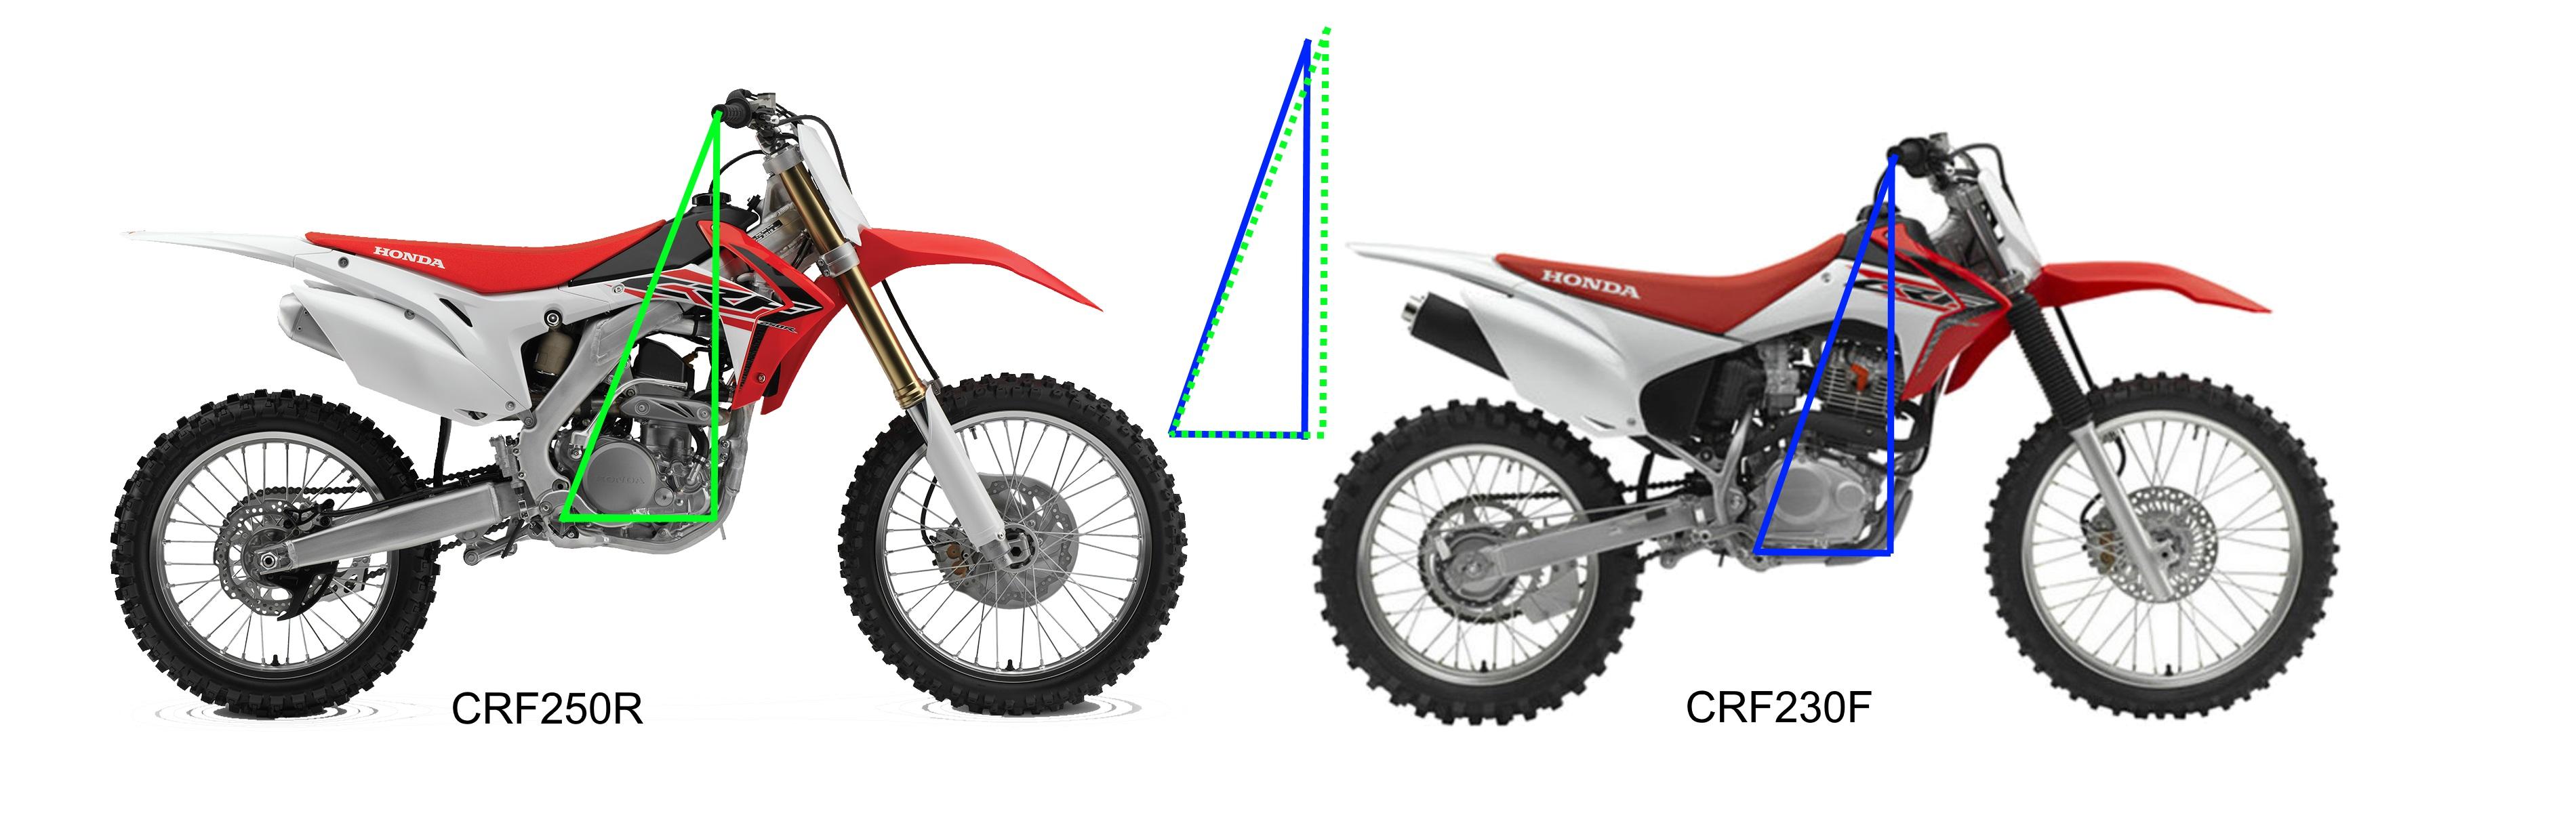 Handle Bar Positioning | CRF230F Mods